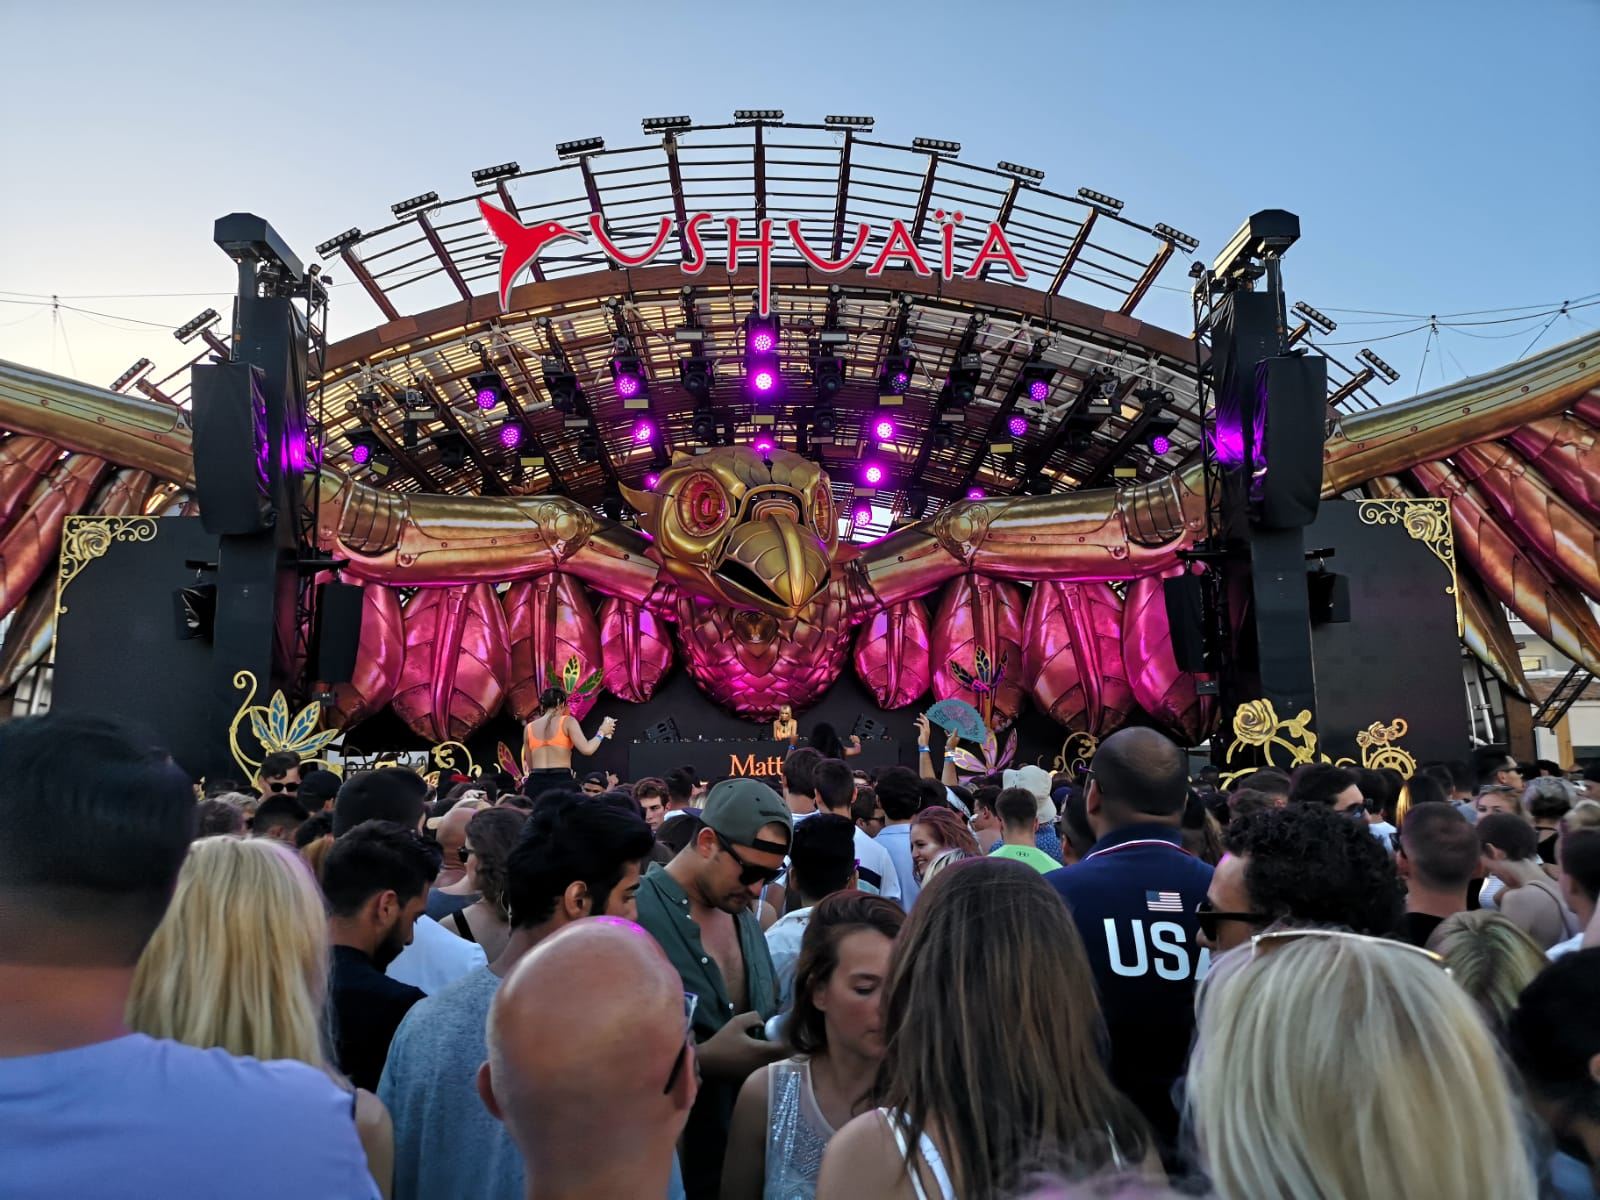 Ushuaia Ibiza (Tomorrowland) | Sergi Casado (AllFest)